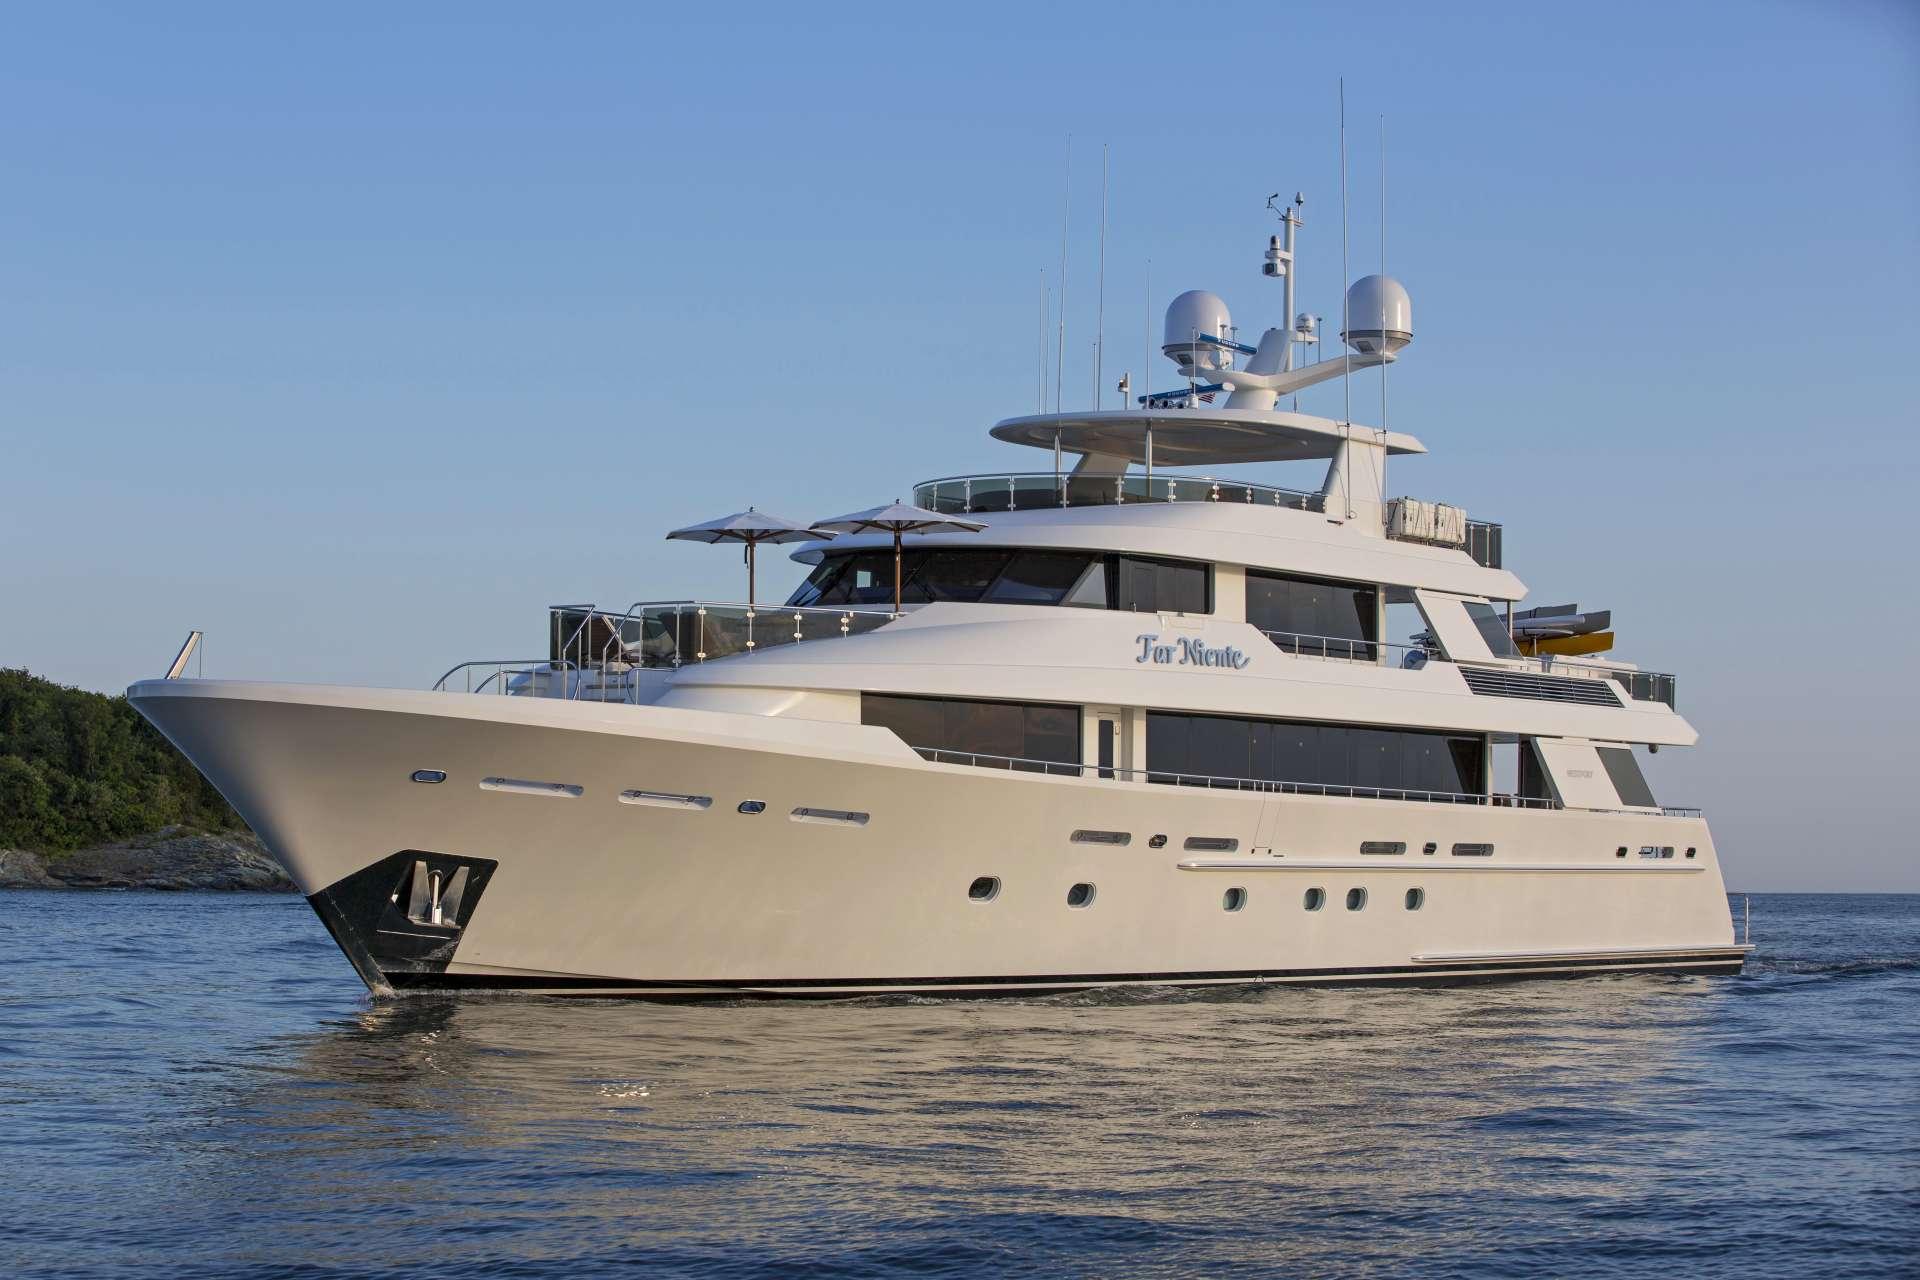 Main image of FAR NIENTE yacht